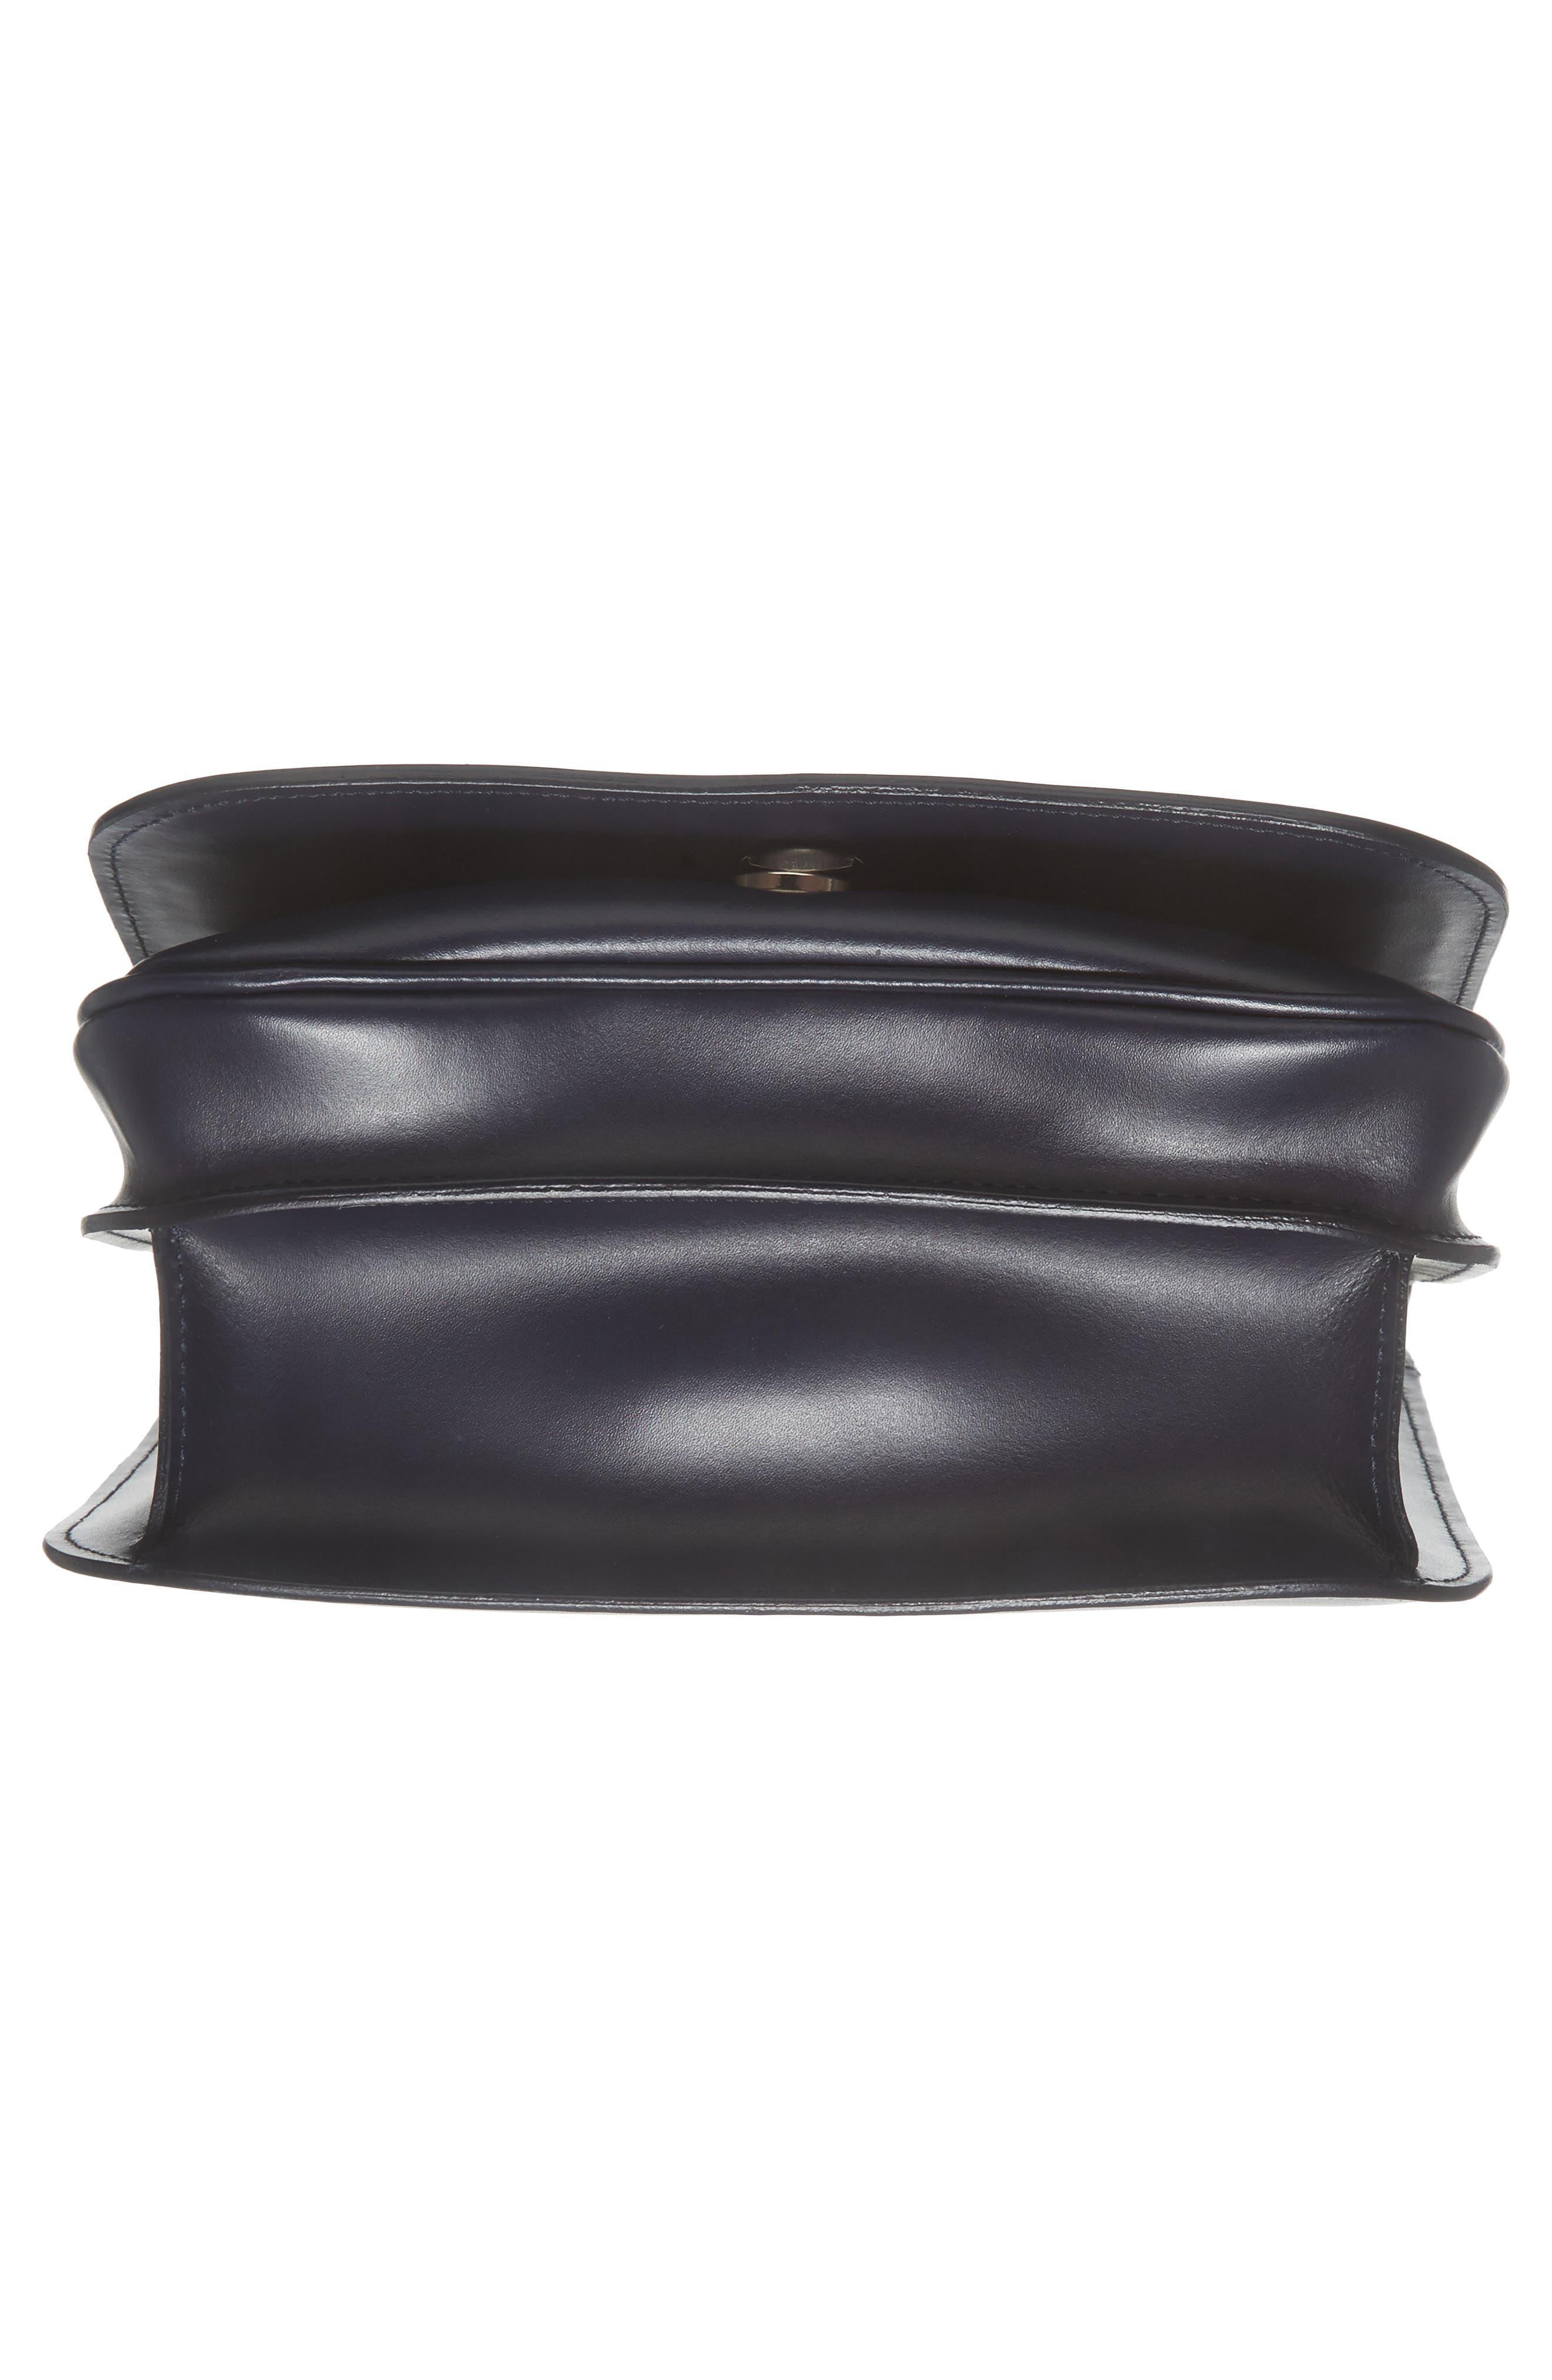 Alternate Image 3  - Creatures of Comfort Leather Equestrian Crossbody Bag